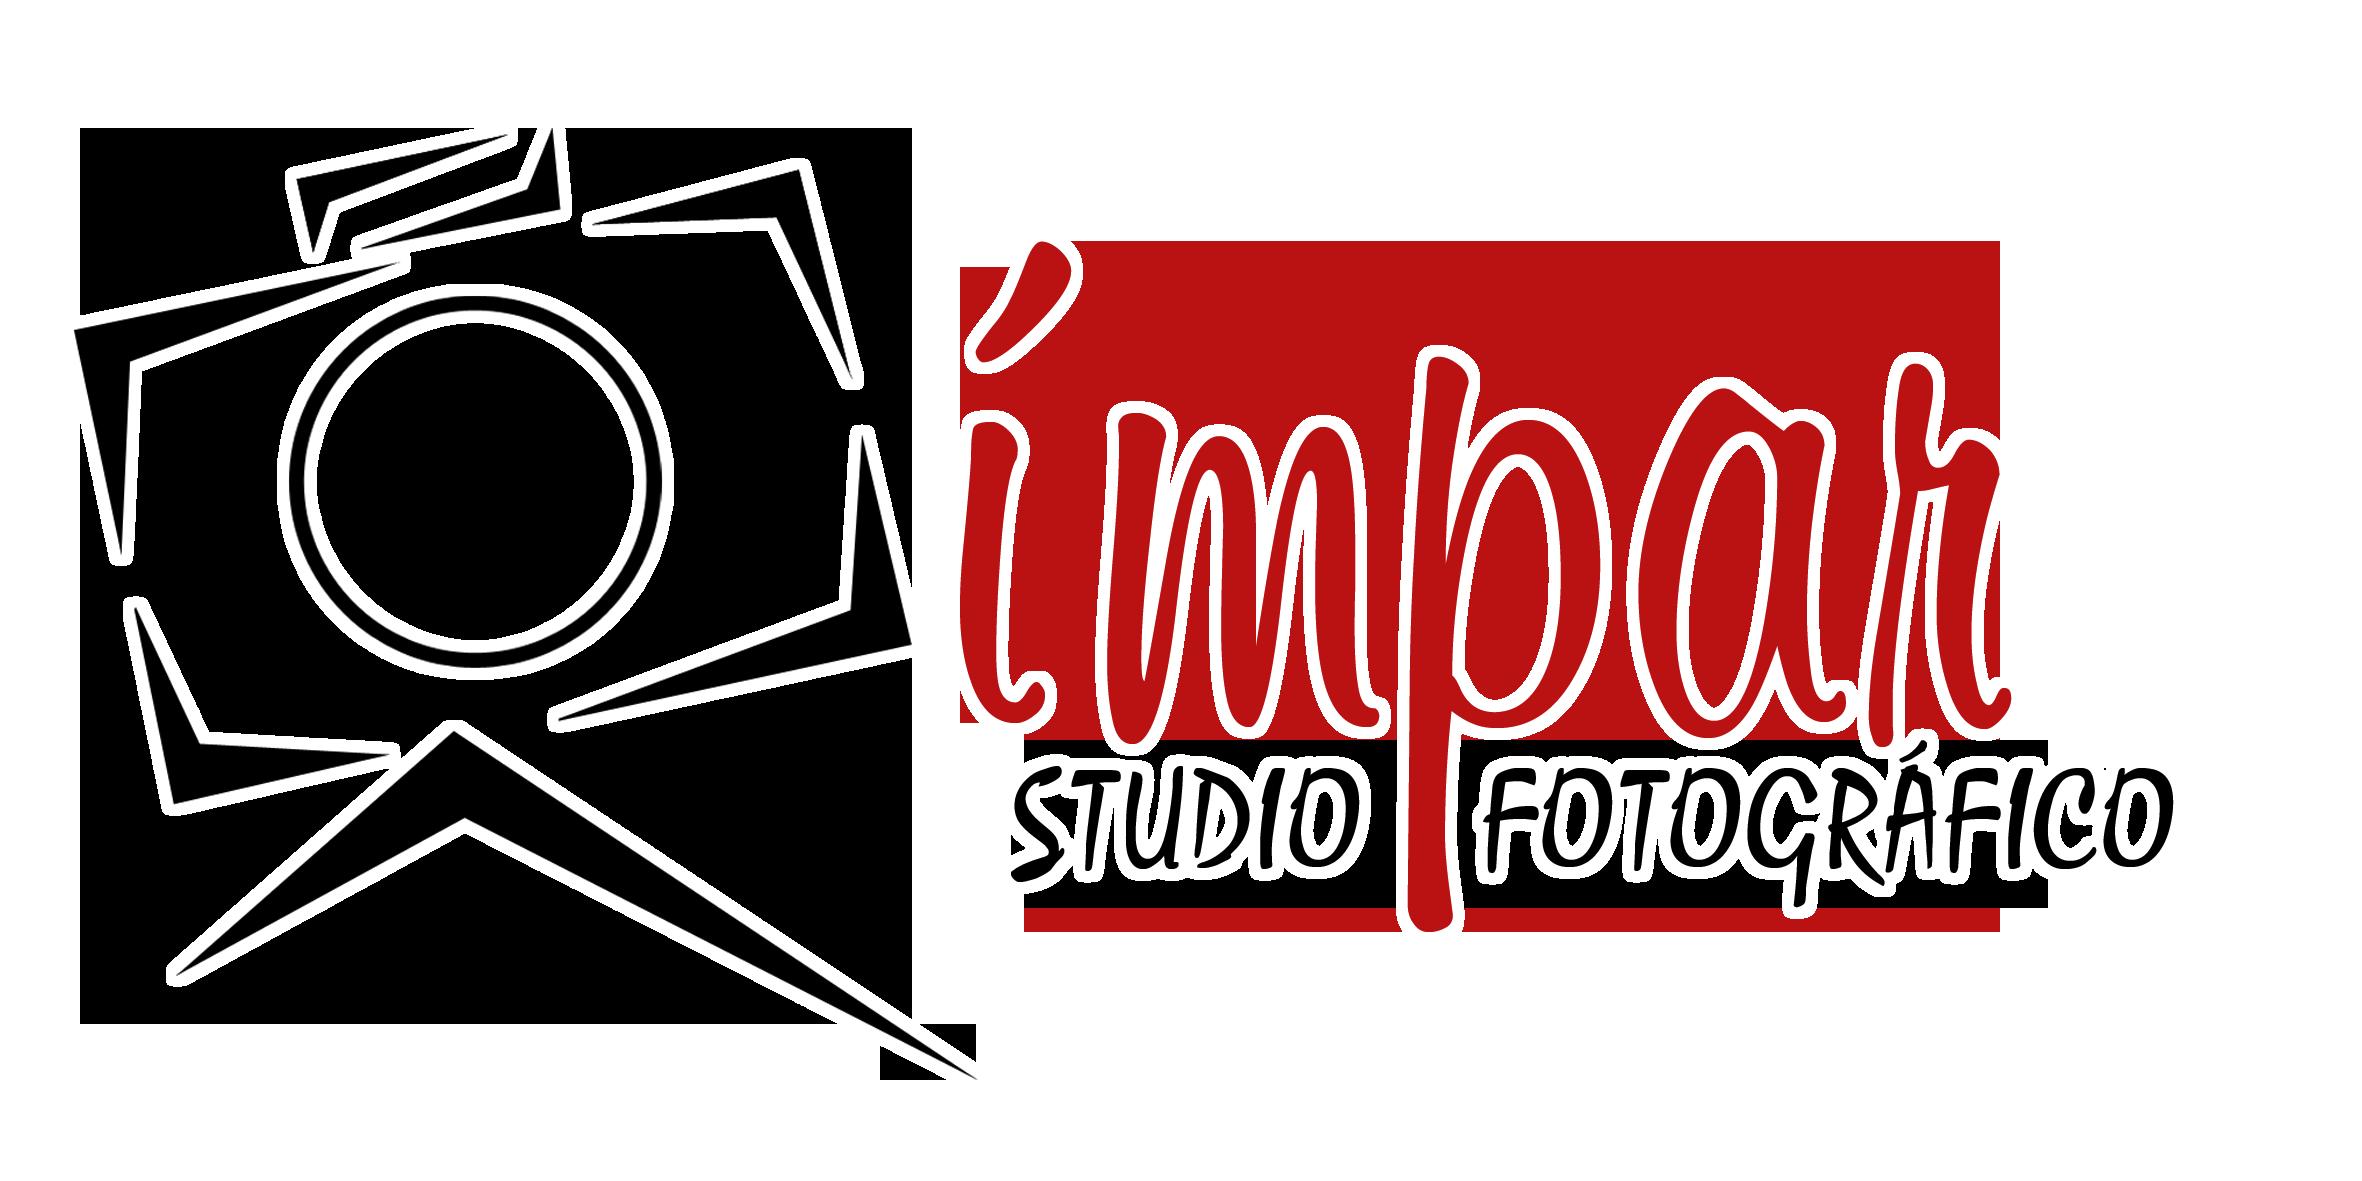 Contate Fotografia de Gestante e Família - Studio Ímpar - Cuiabá e Várzea Grande - MT